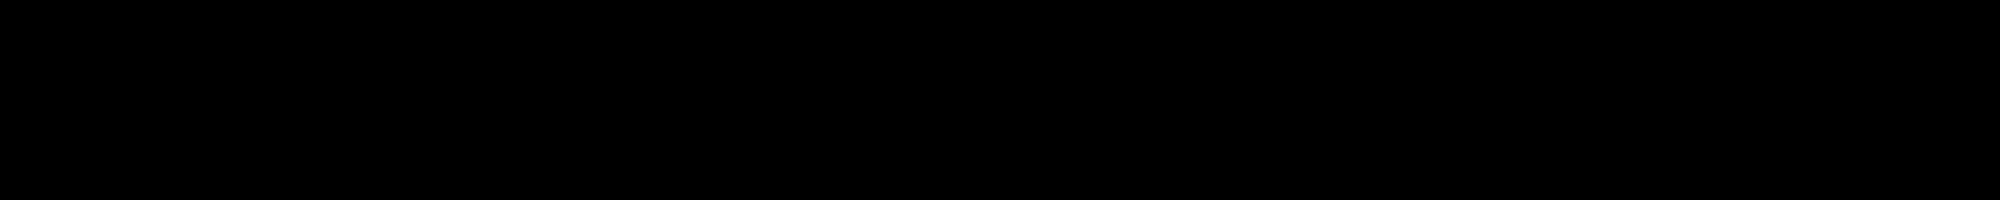 Line polka dot